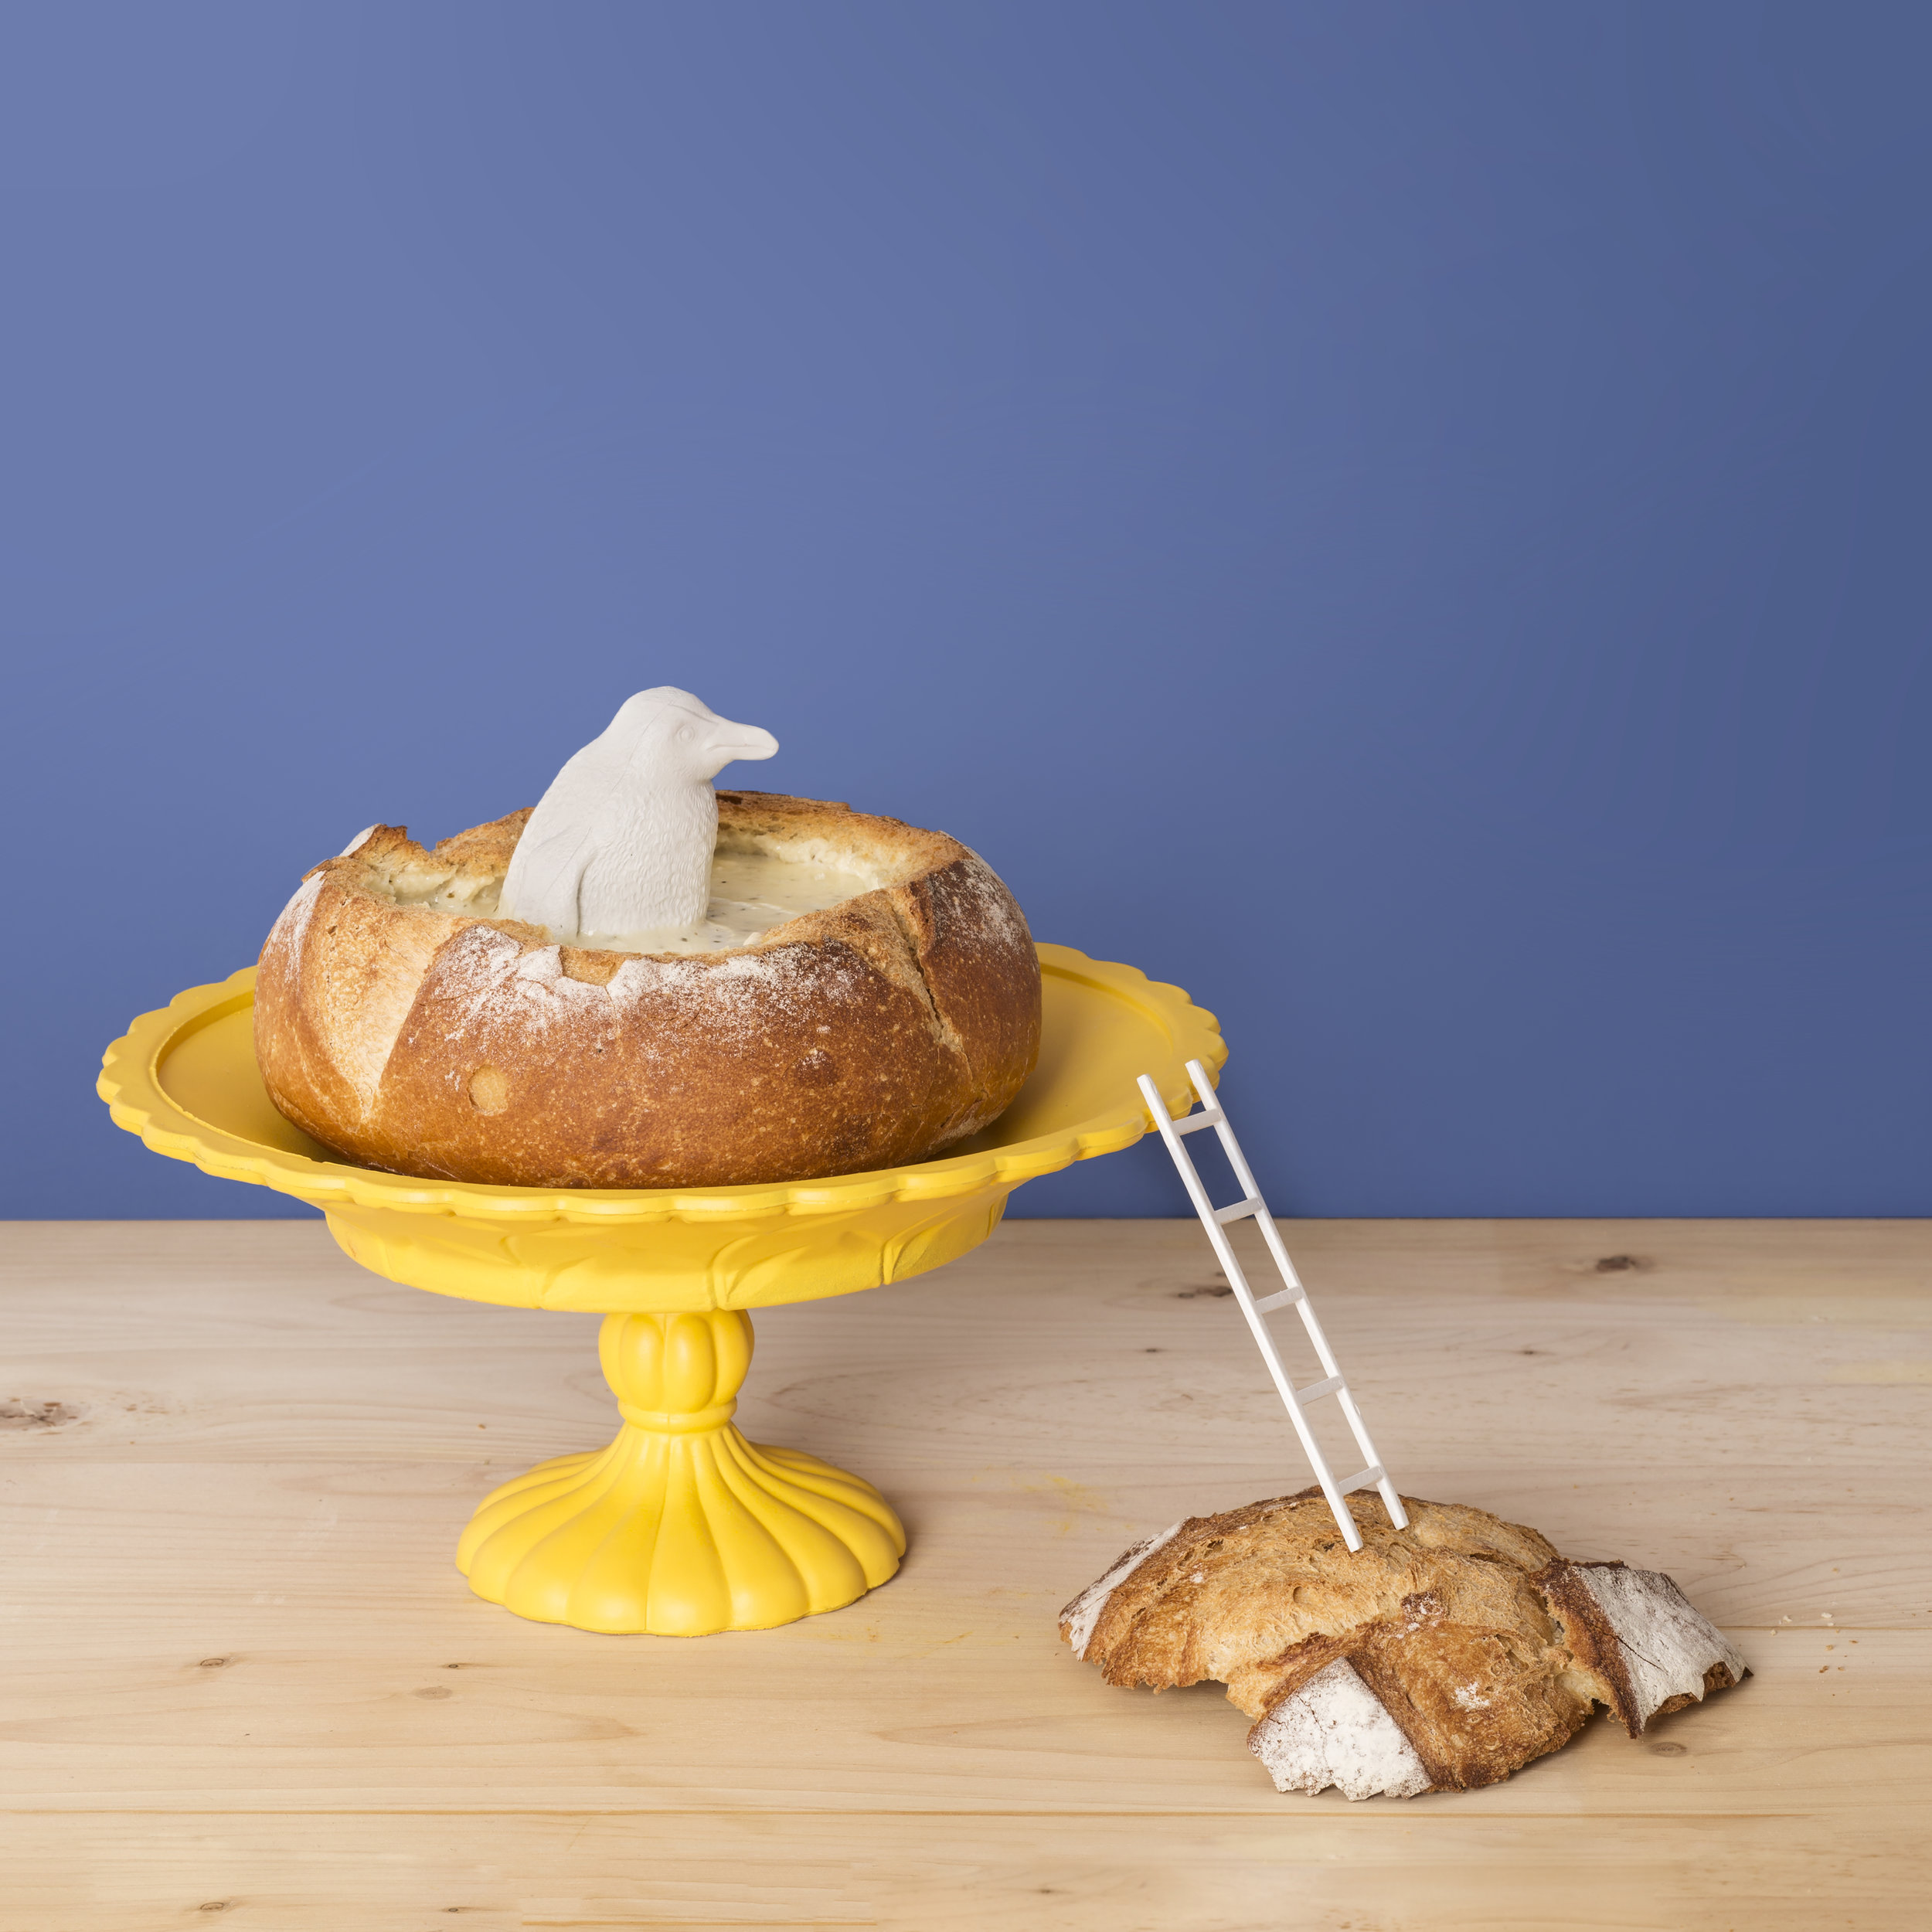 April 11th - Cheese Fondue Day